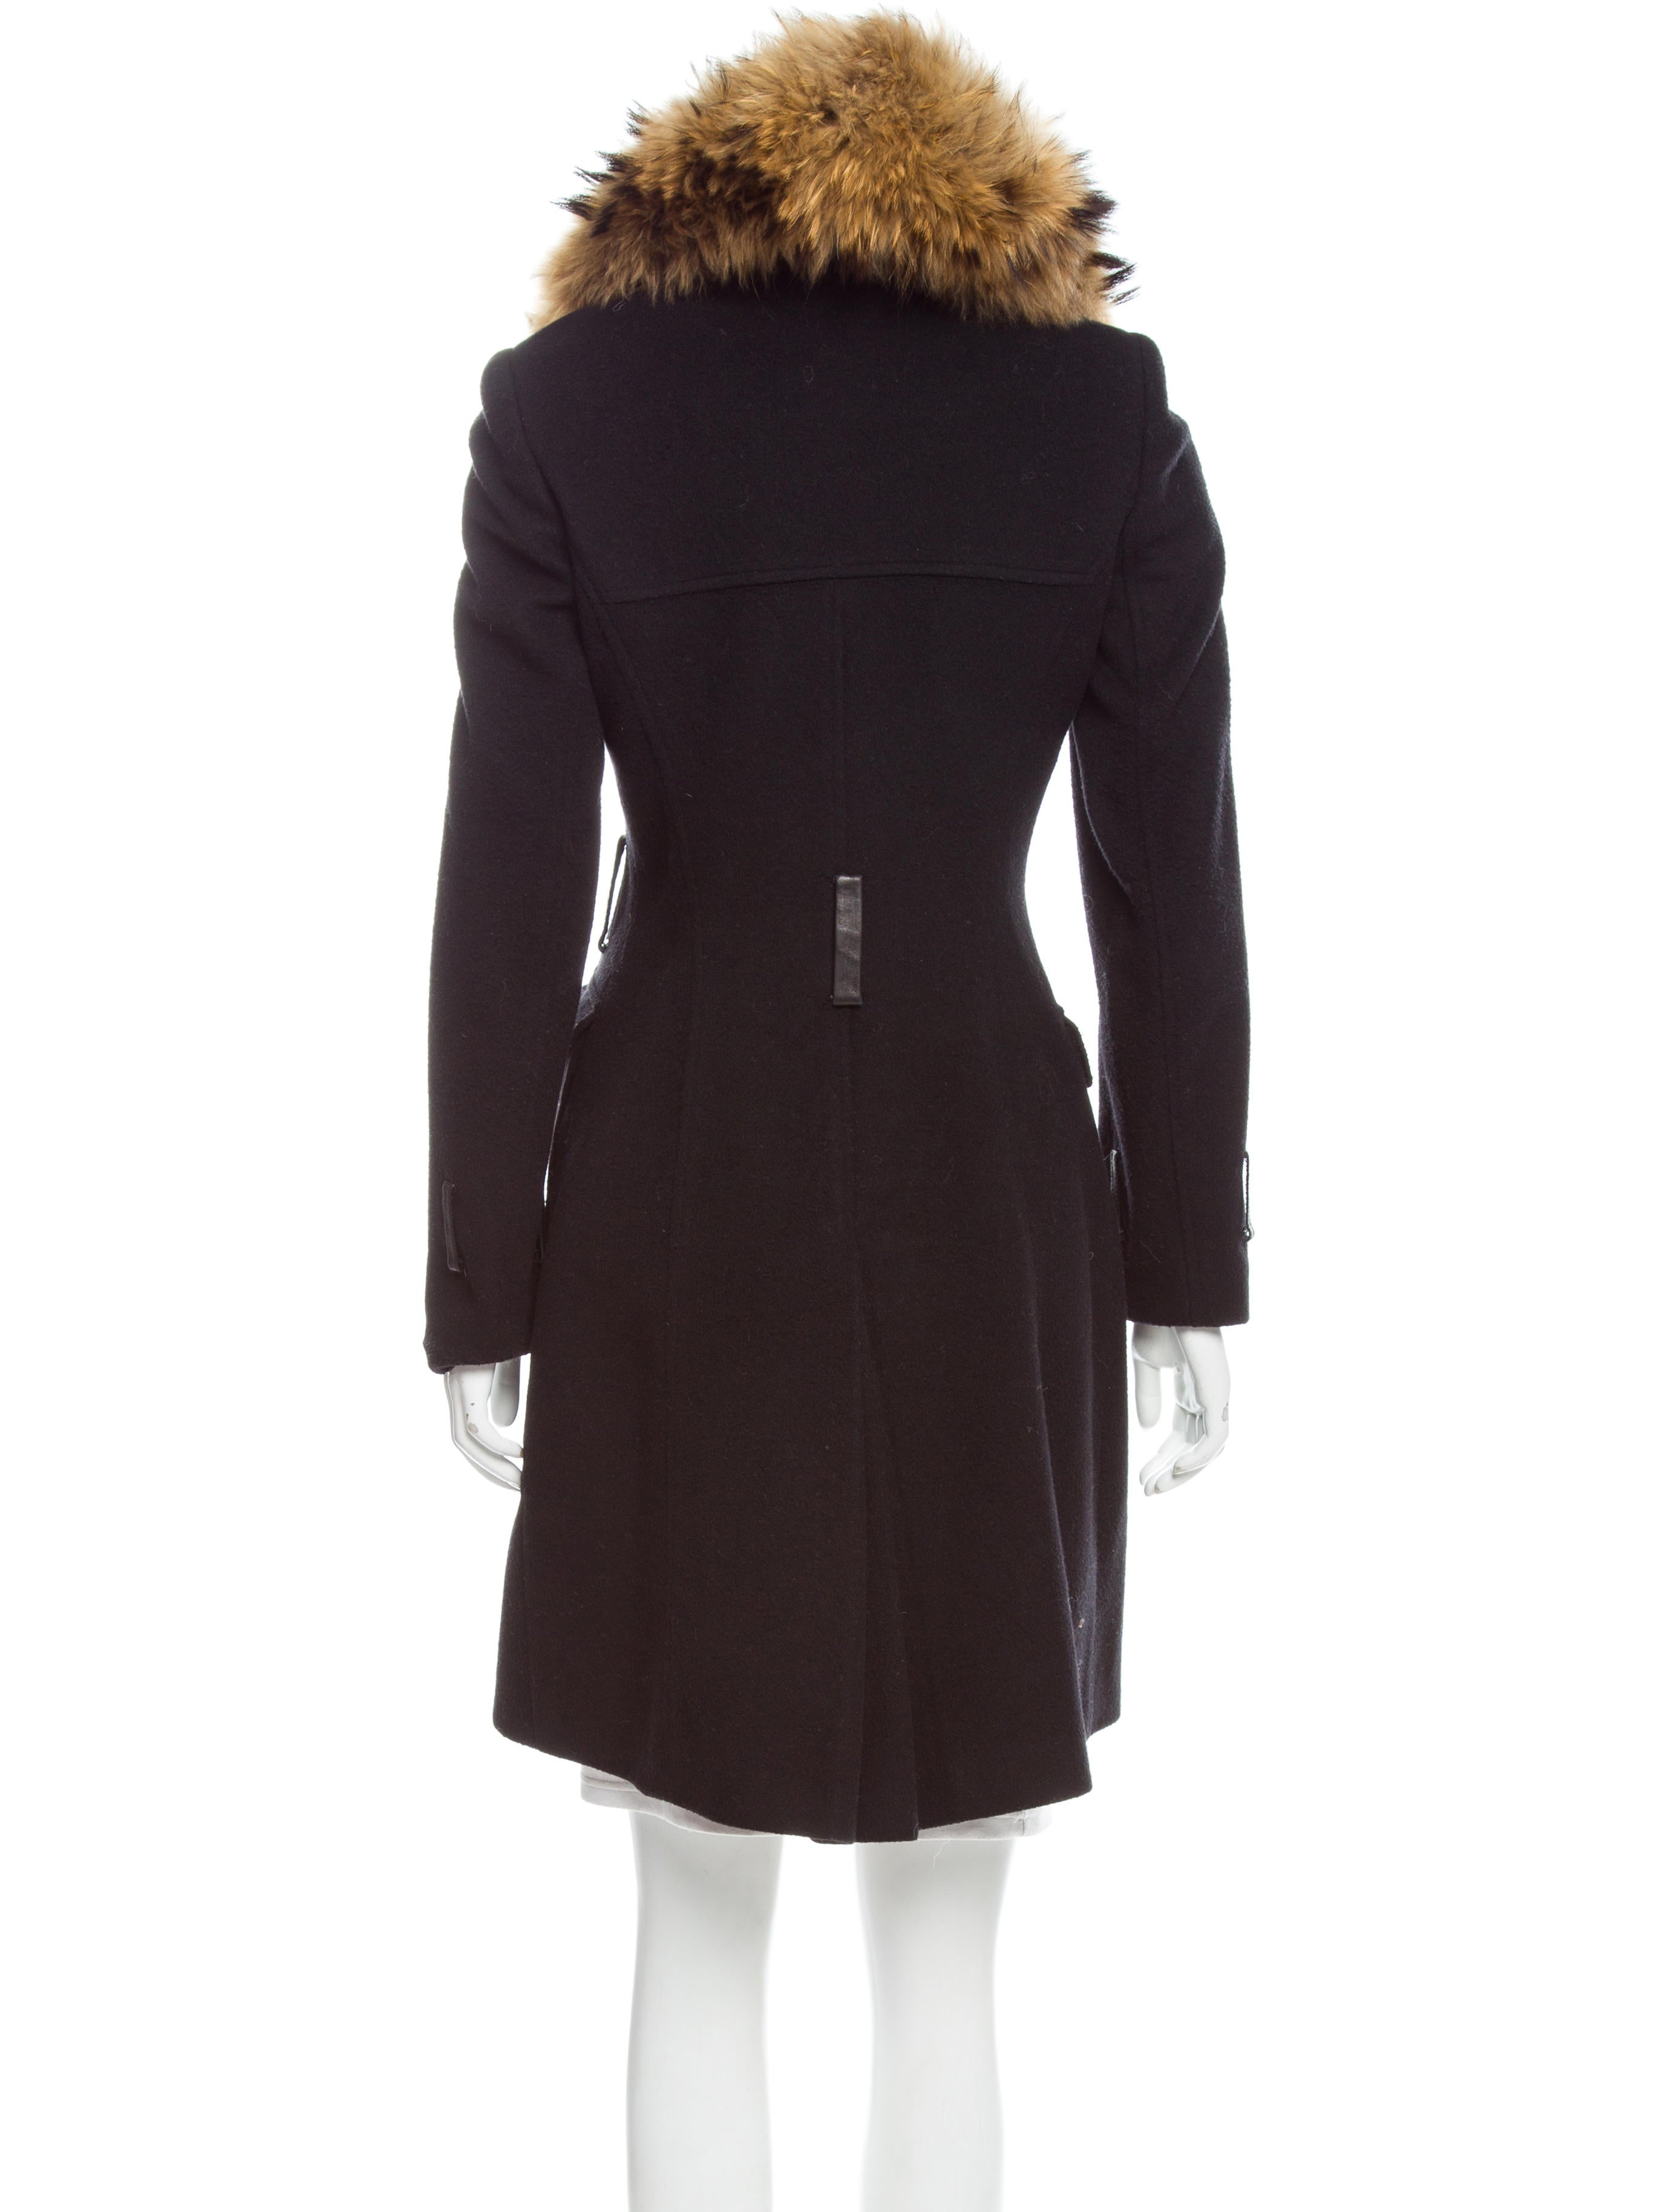 Find great deals on eBay for vintage fur trimmed wool coat. Shop with confidence.